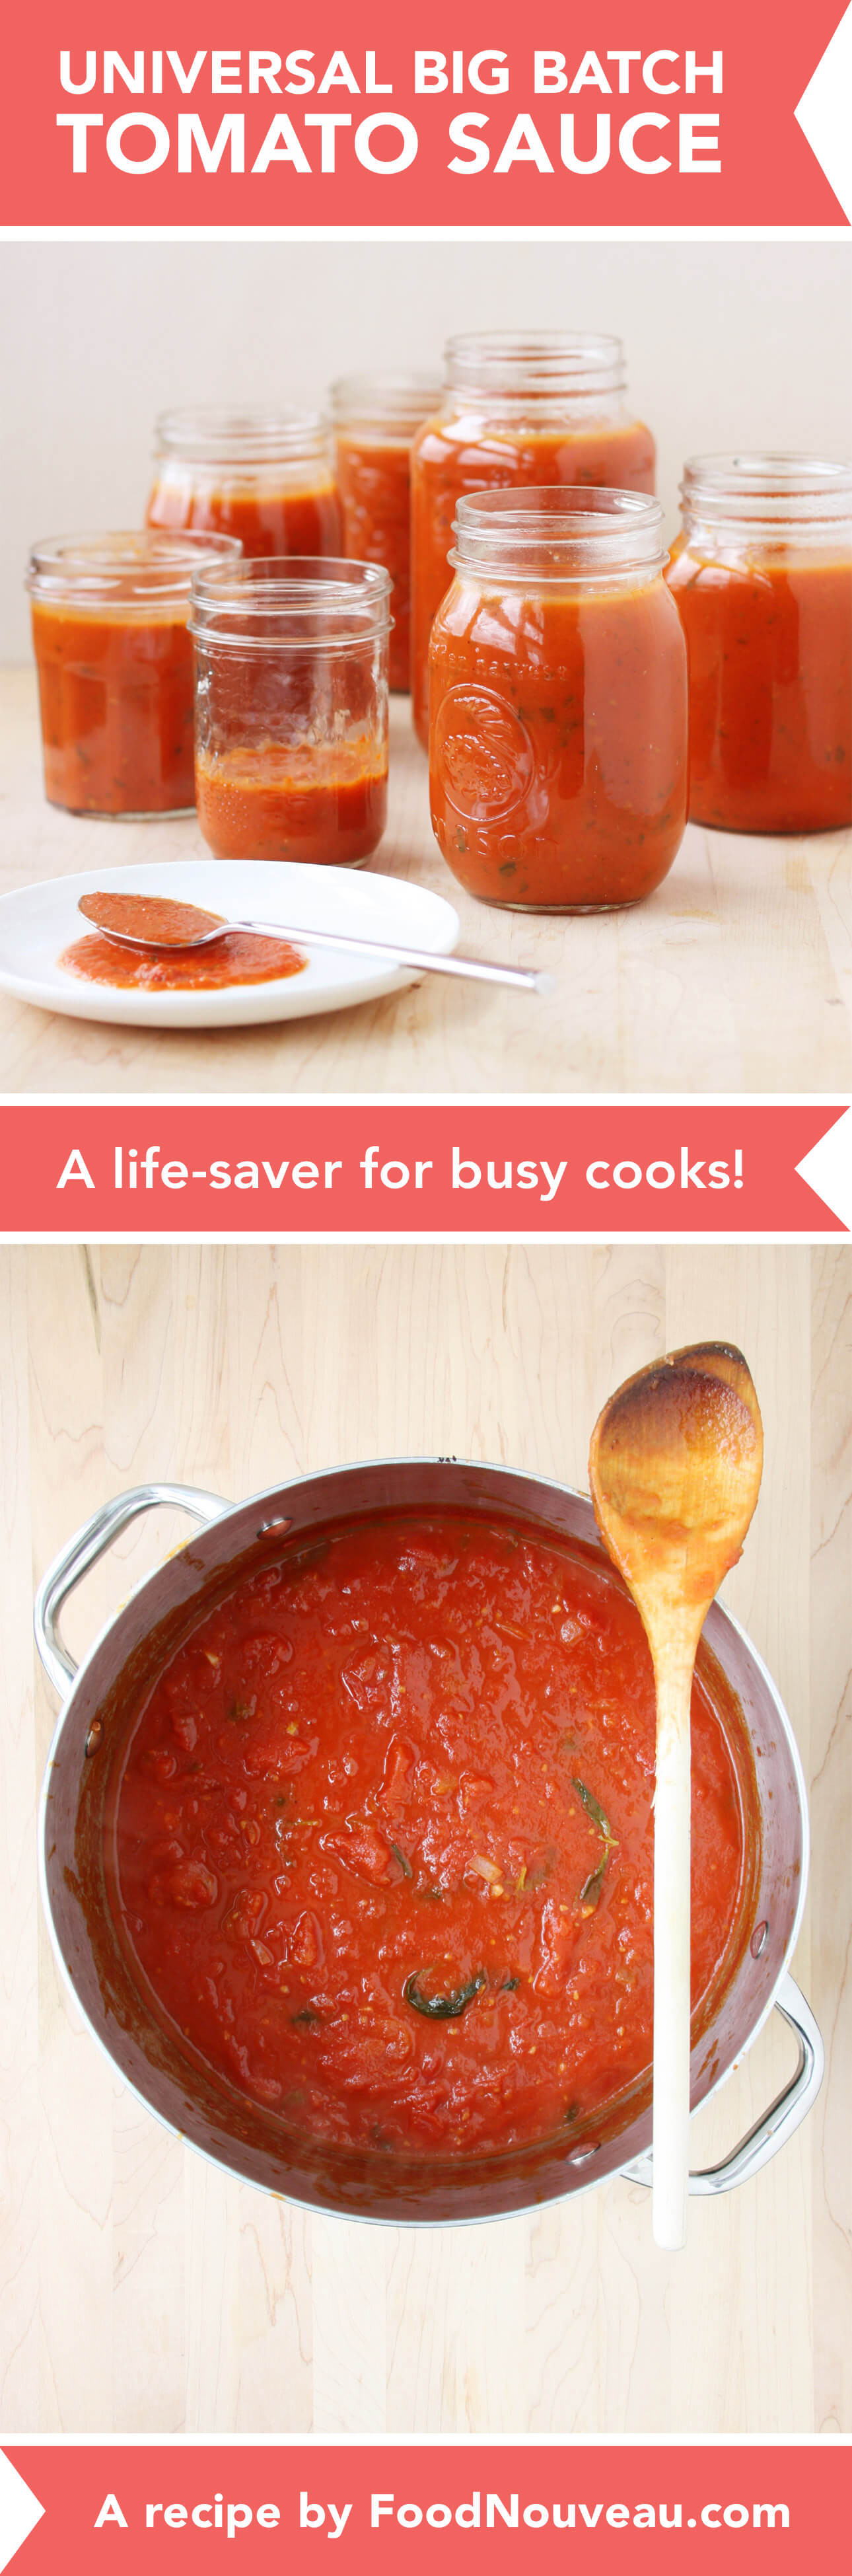 How Long Does Tomato Sauce Last In The Fridge  Universal Big Batch Tomato Sauce Food Nouveau